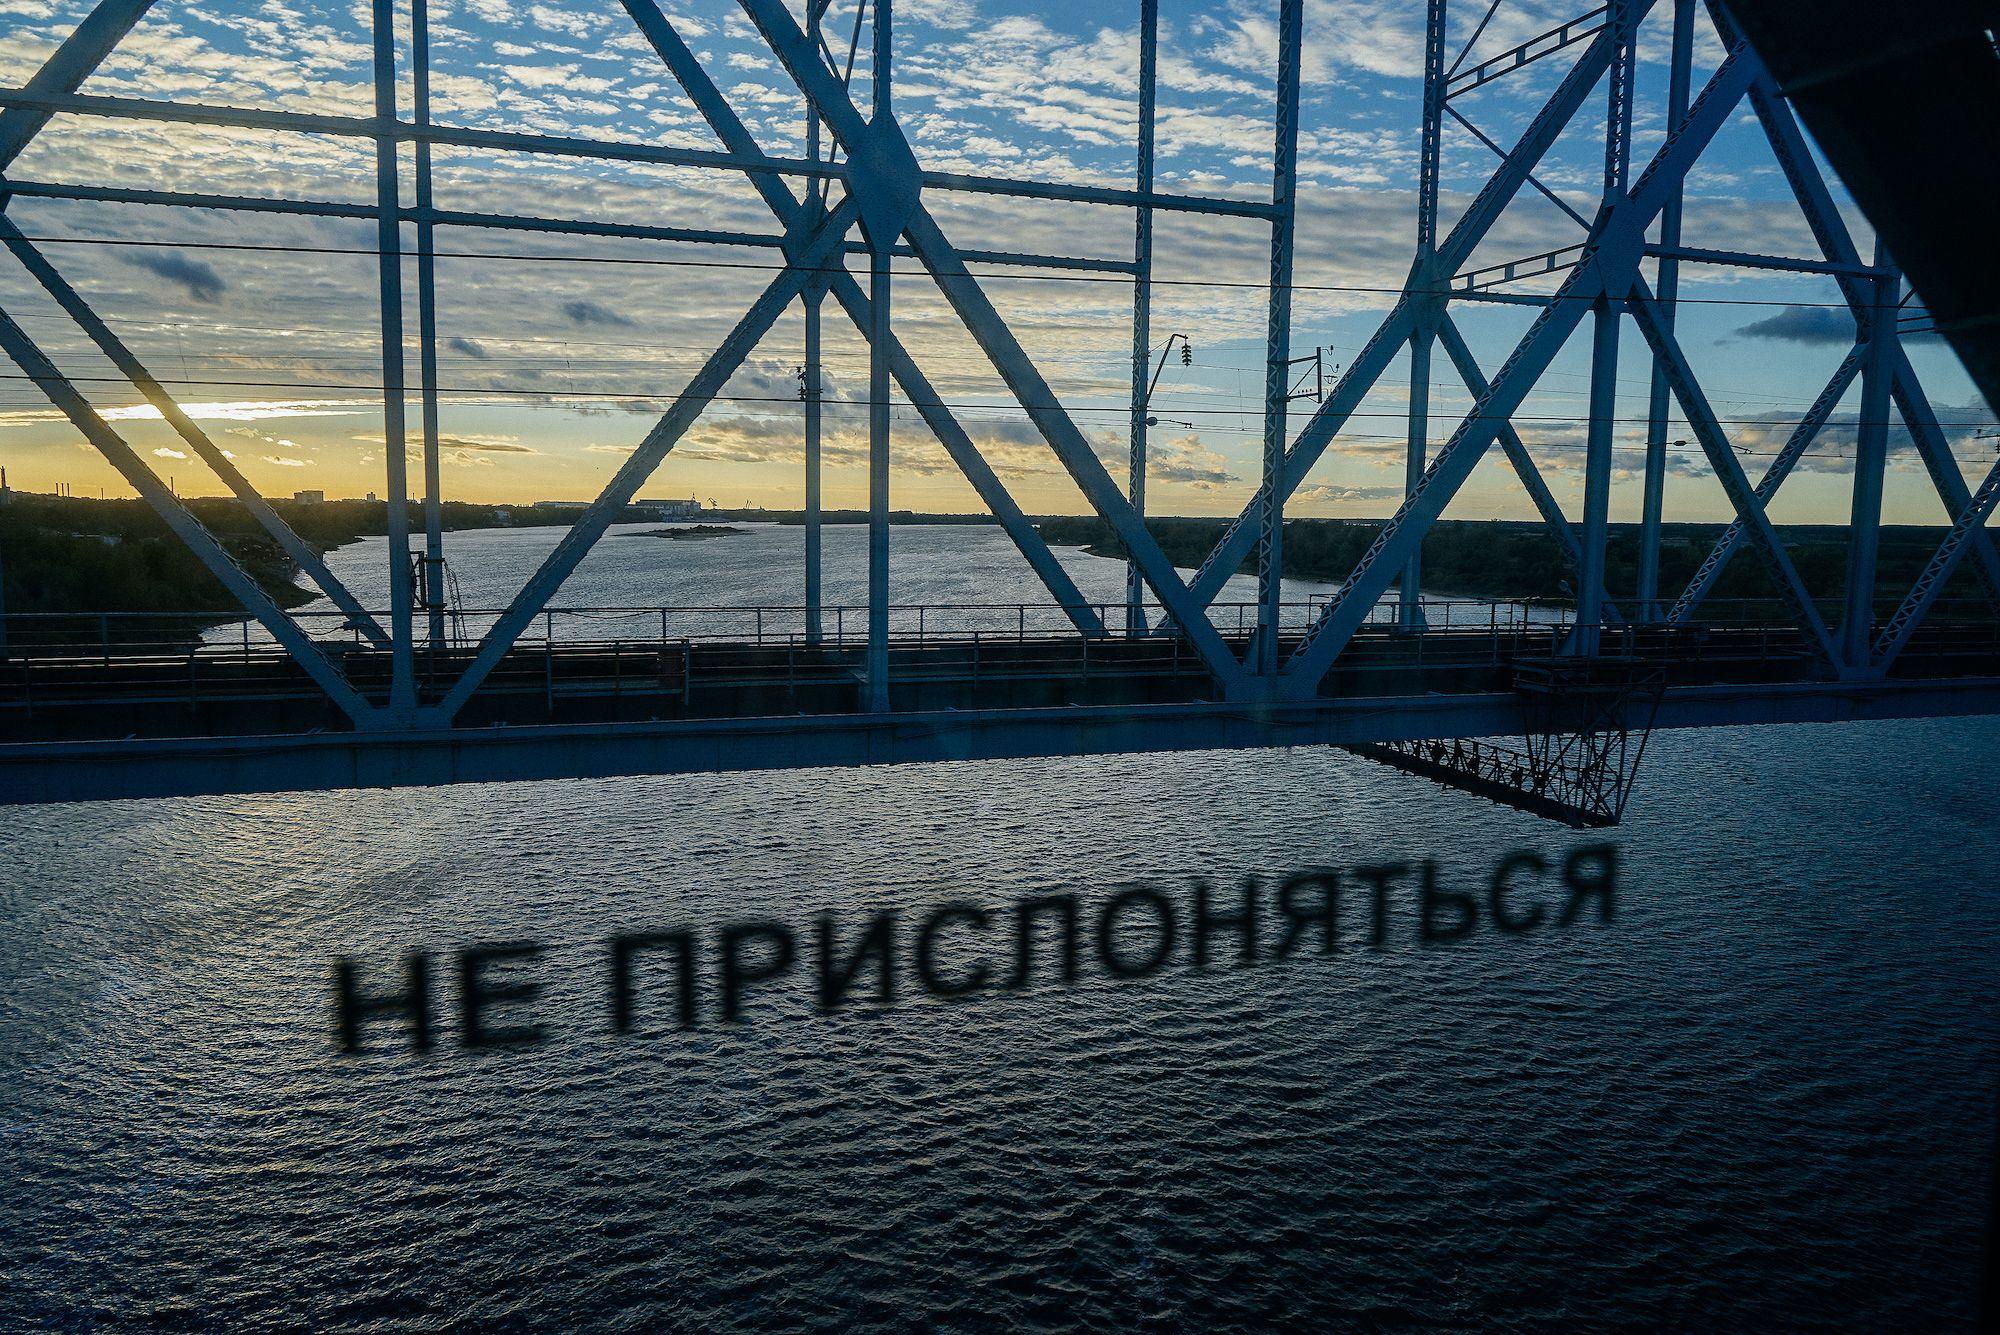 """На электричках до Байкала. День 1"" by Alex Abanin"